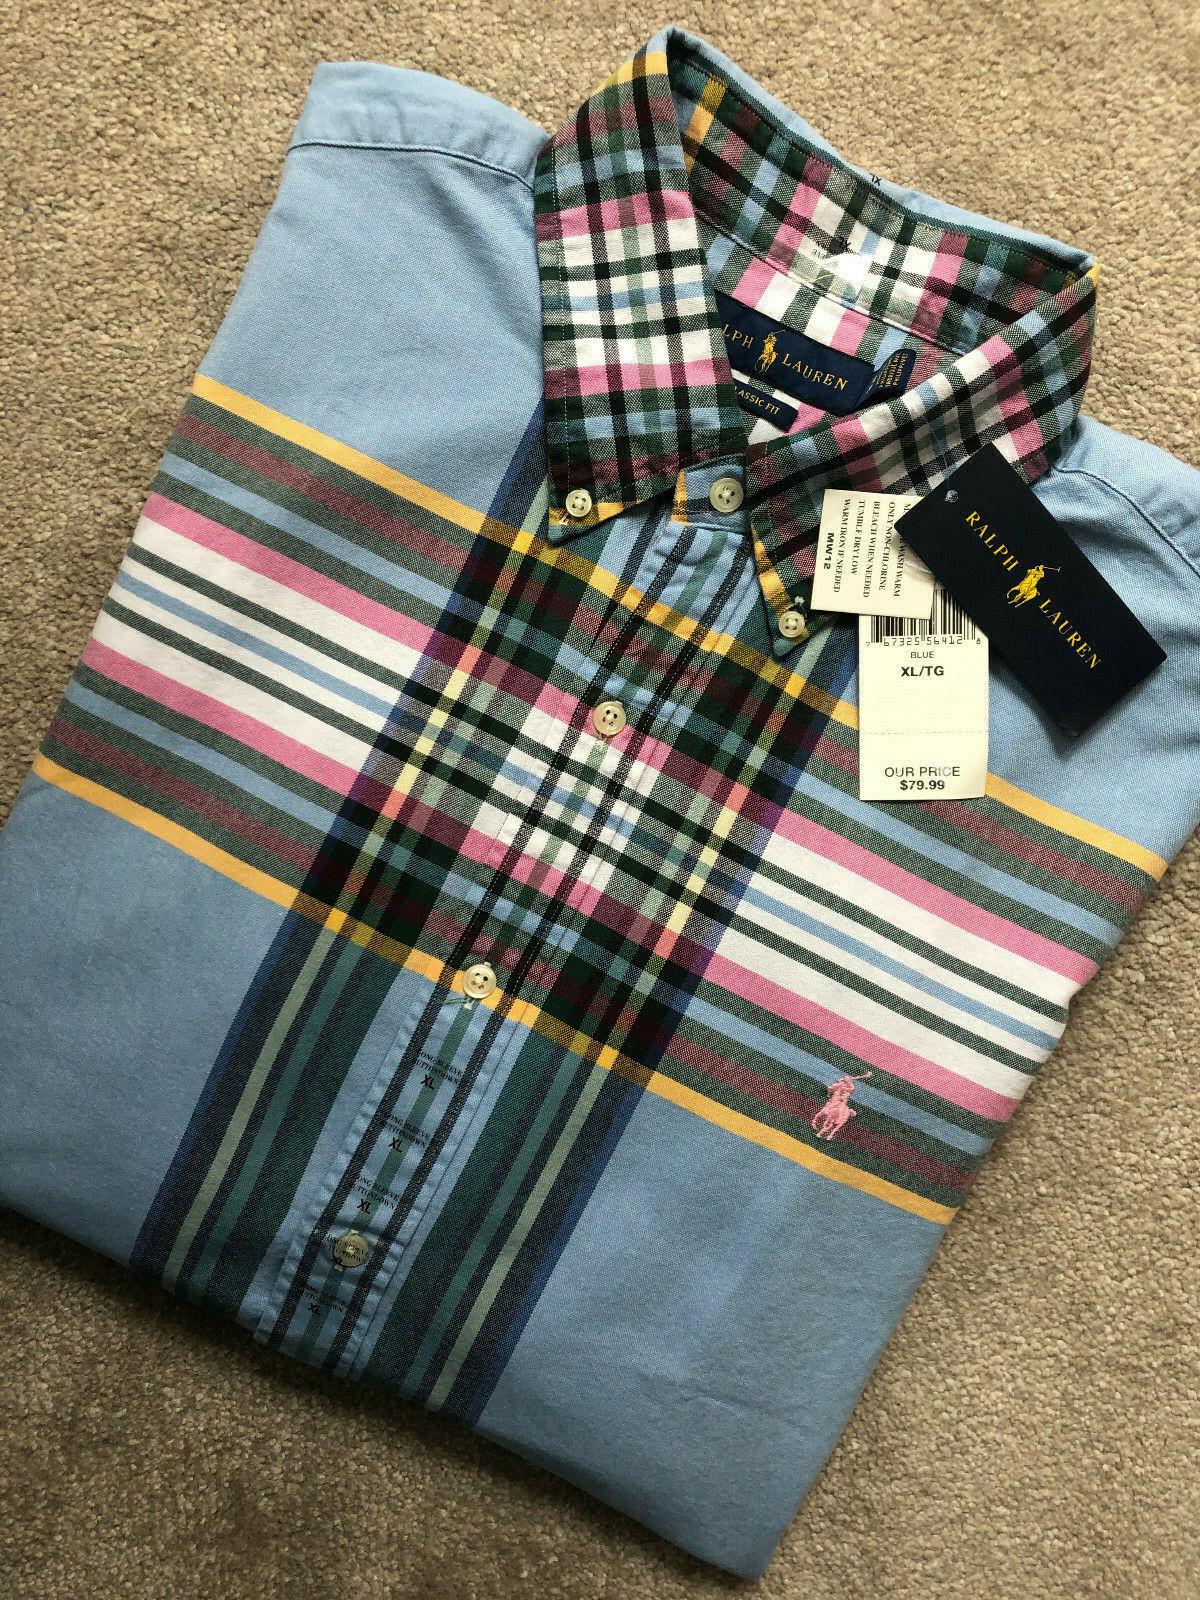 RALPH LAUREN bleu Classic Fit Check L S Shirt Top USA Model-XL-NEUF & étiquettes